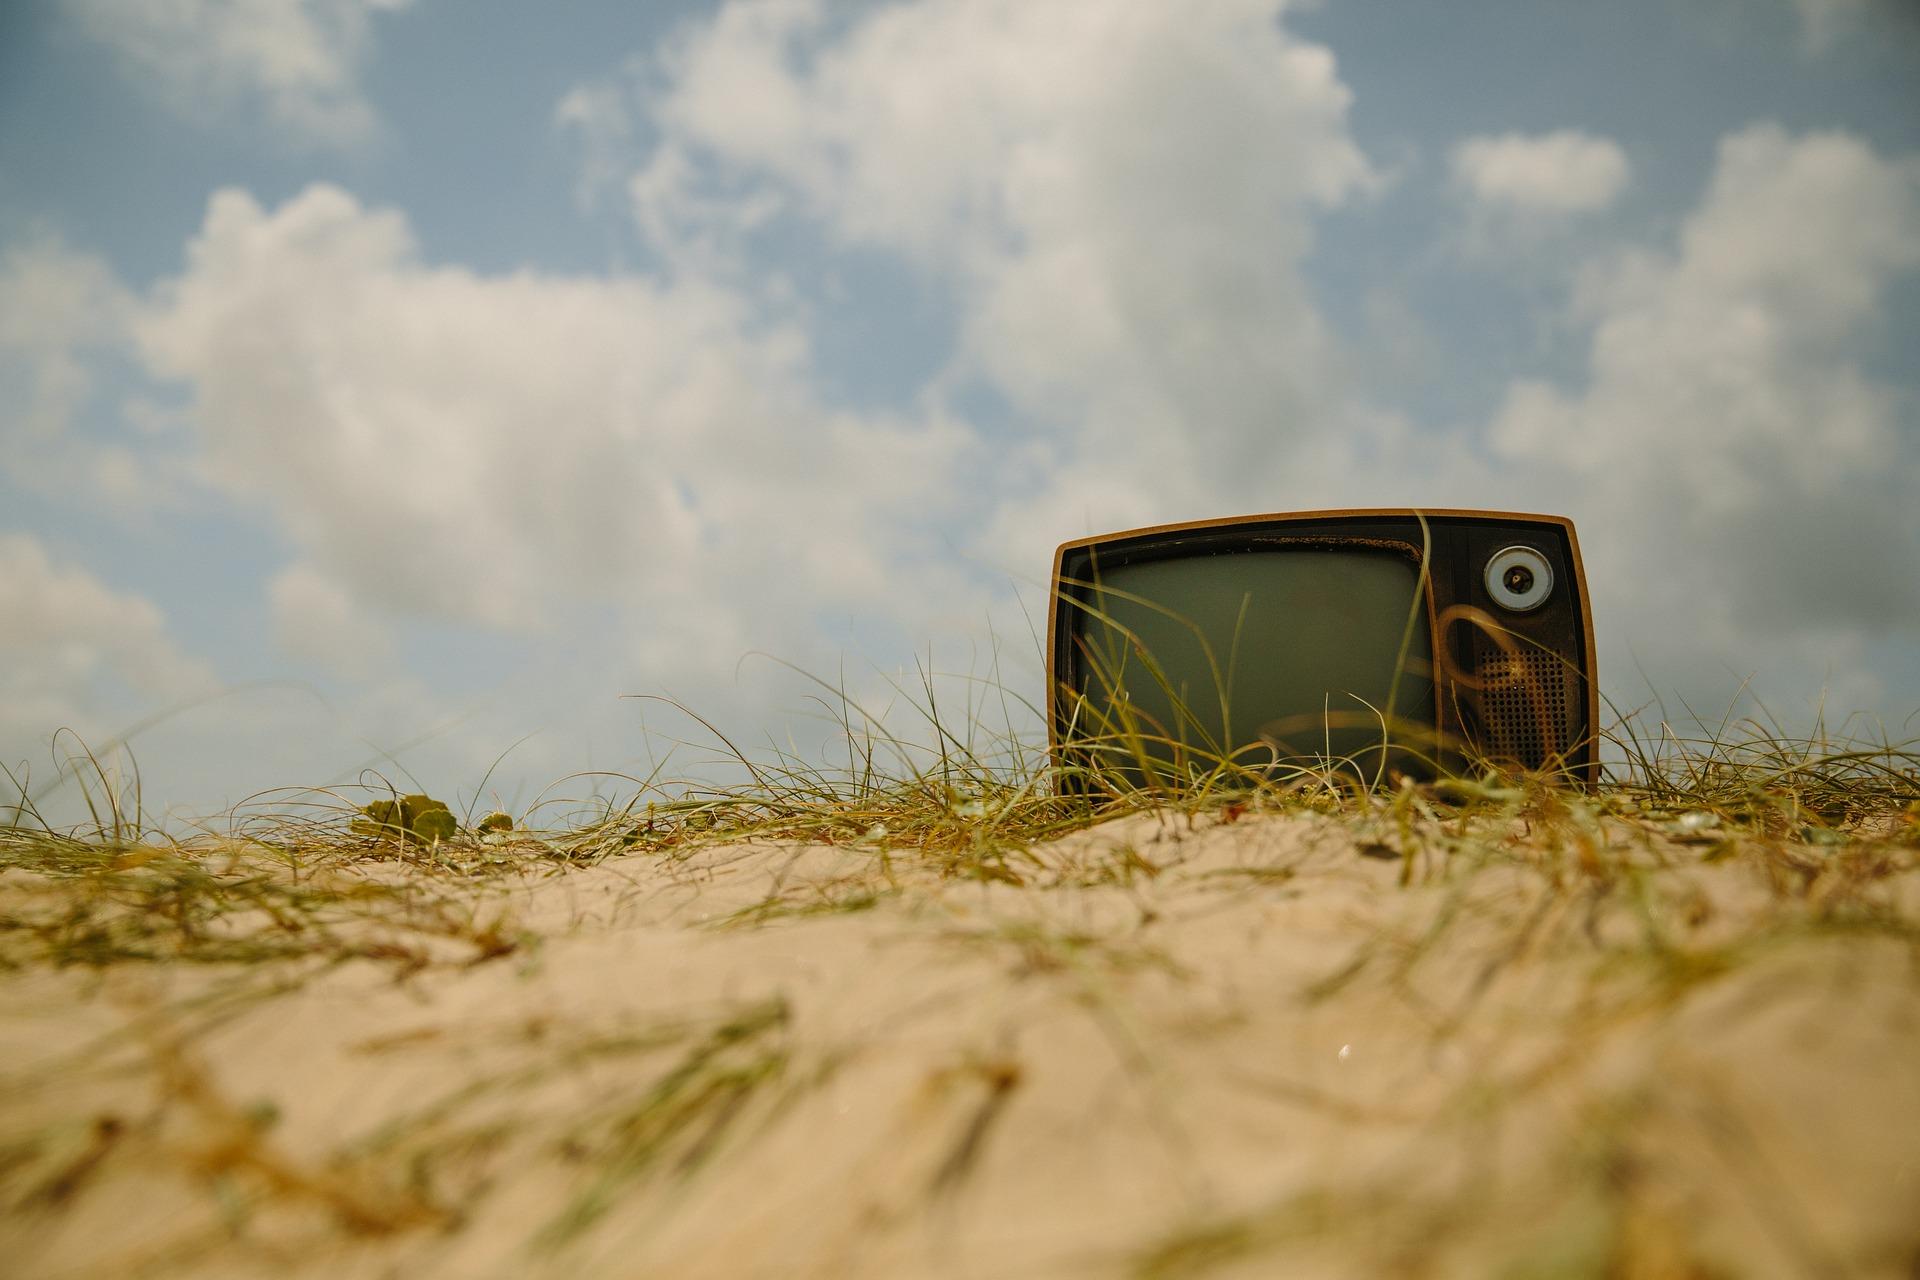 nie oglądam telewizji